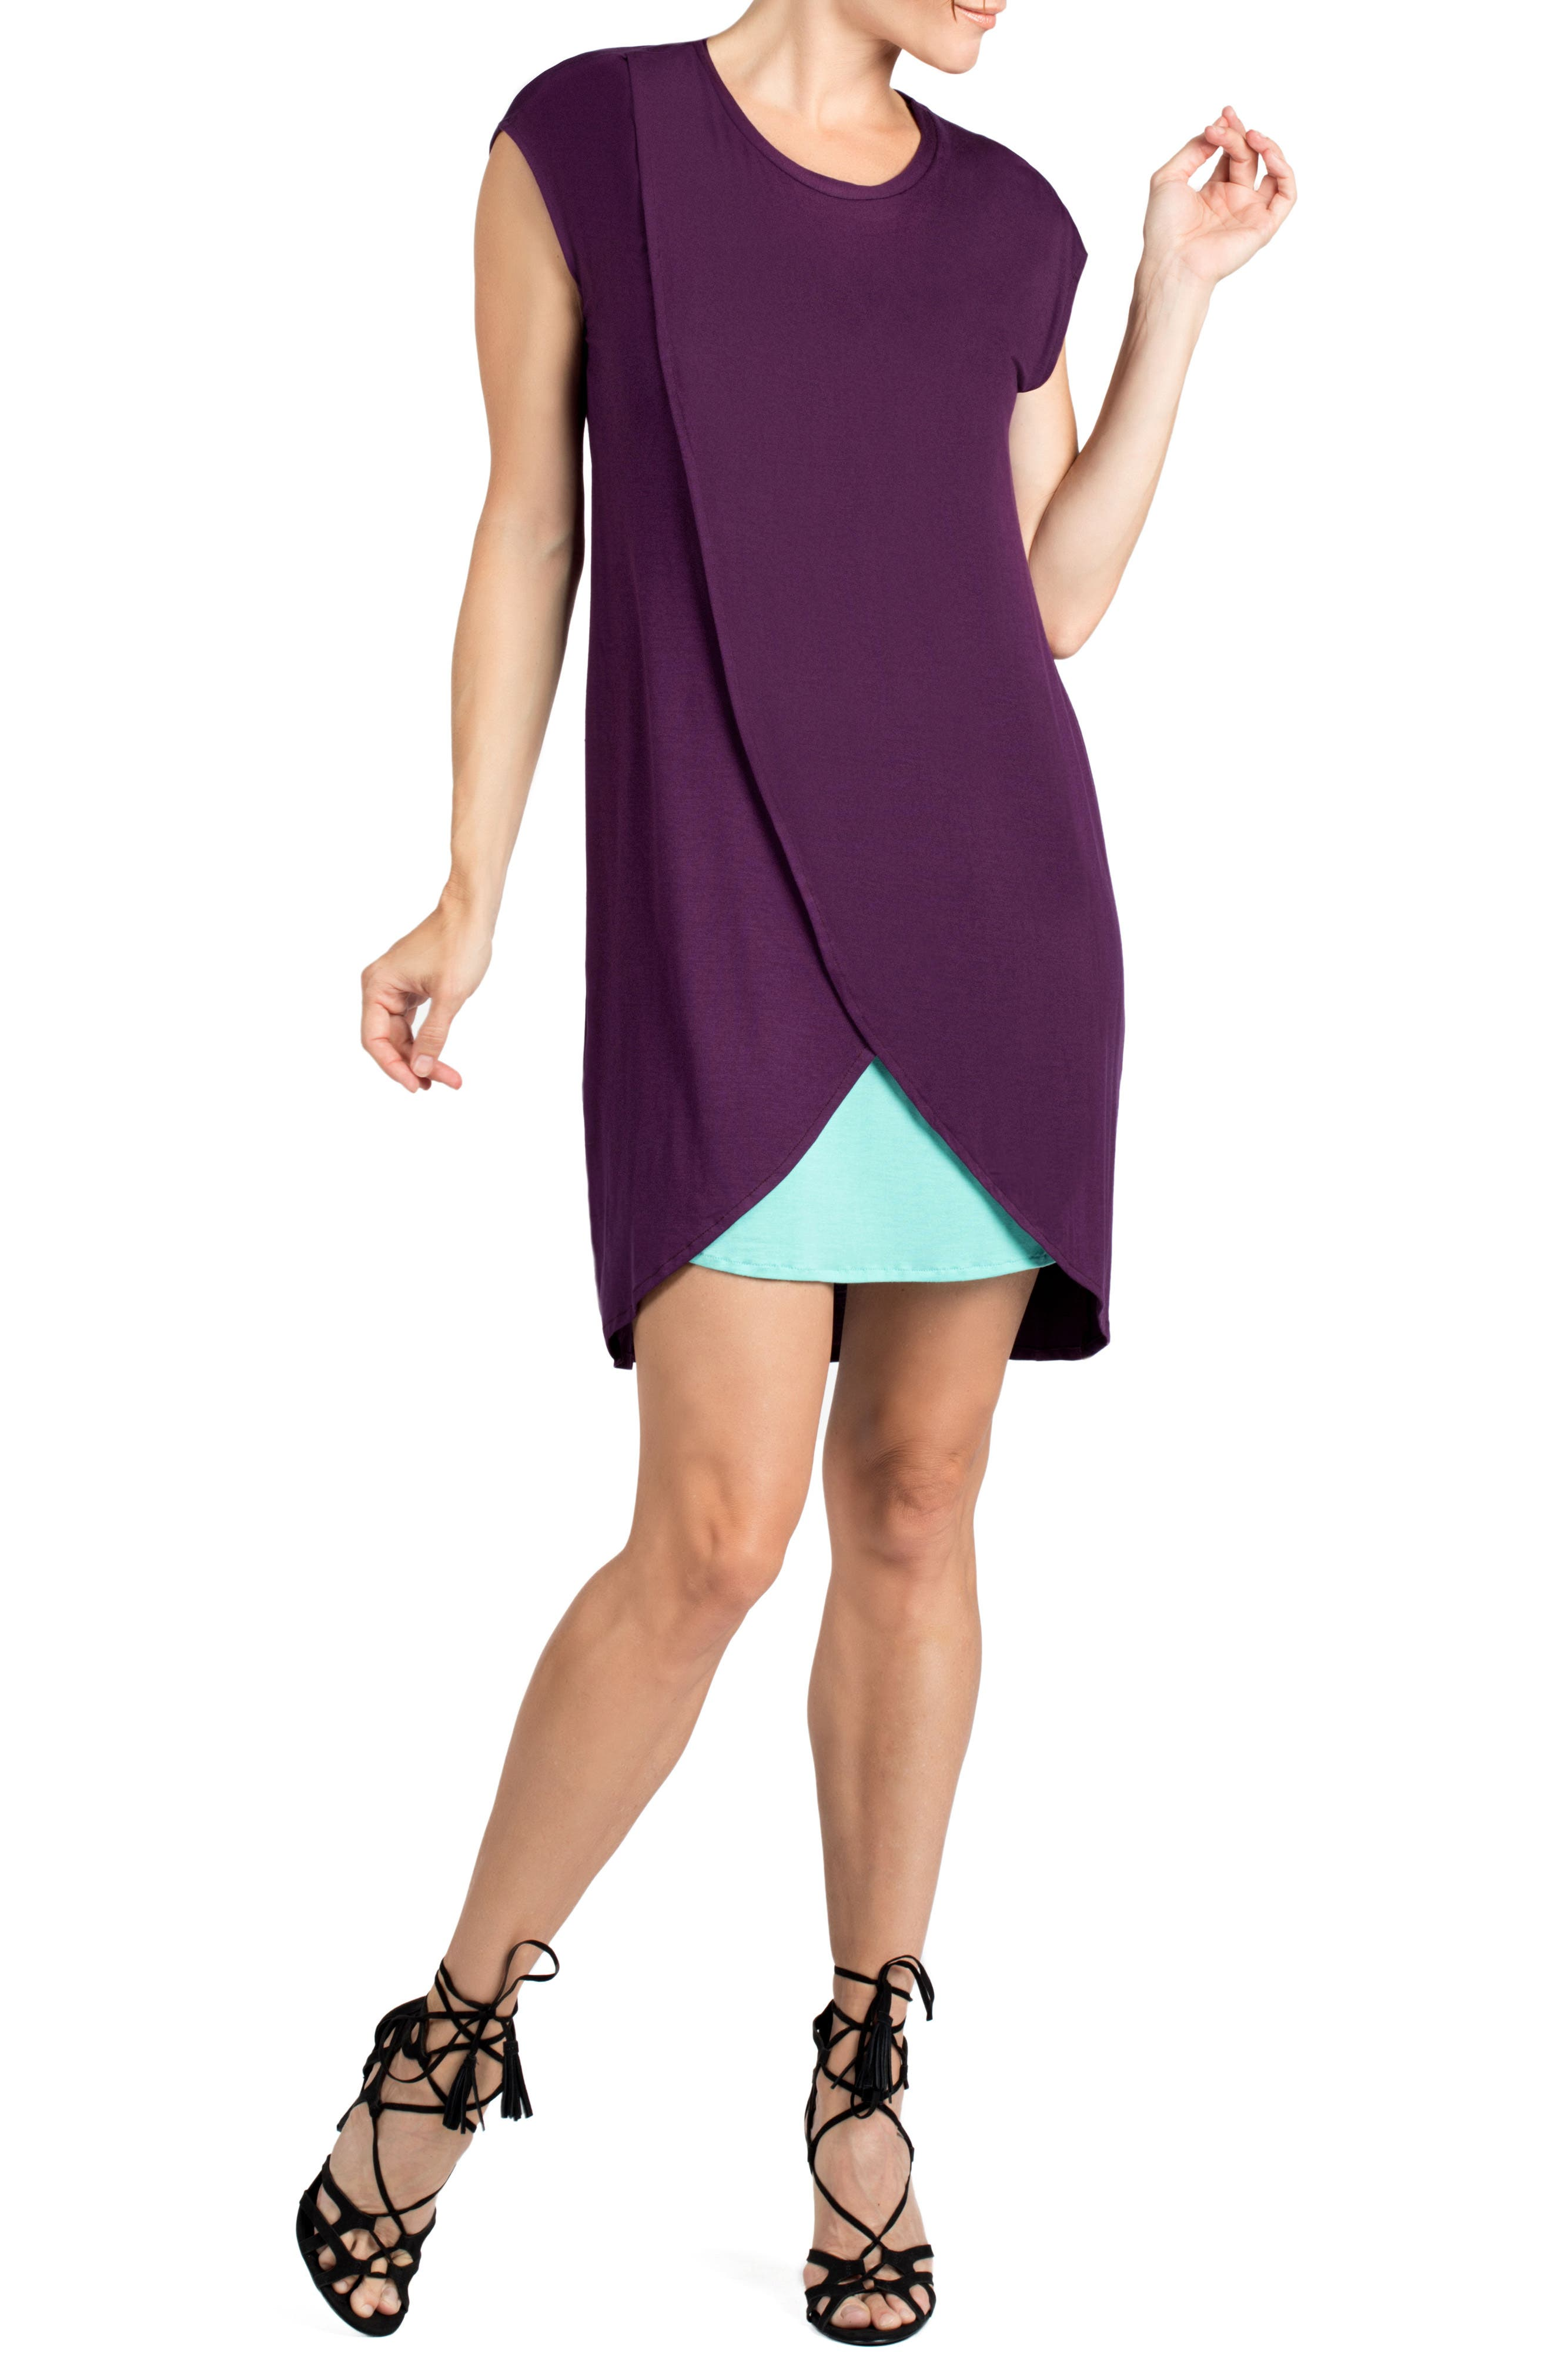 Lille Layered Maternity/Nursing Sheath Dress,                             Main thumbnail 1, color,                             EGGPLANT/ DARK MINT CONTRAST